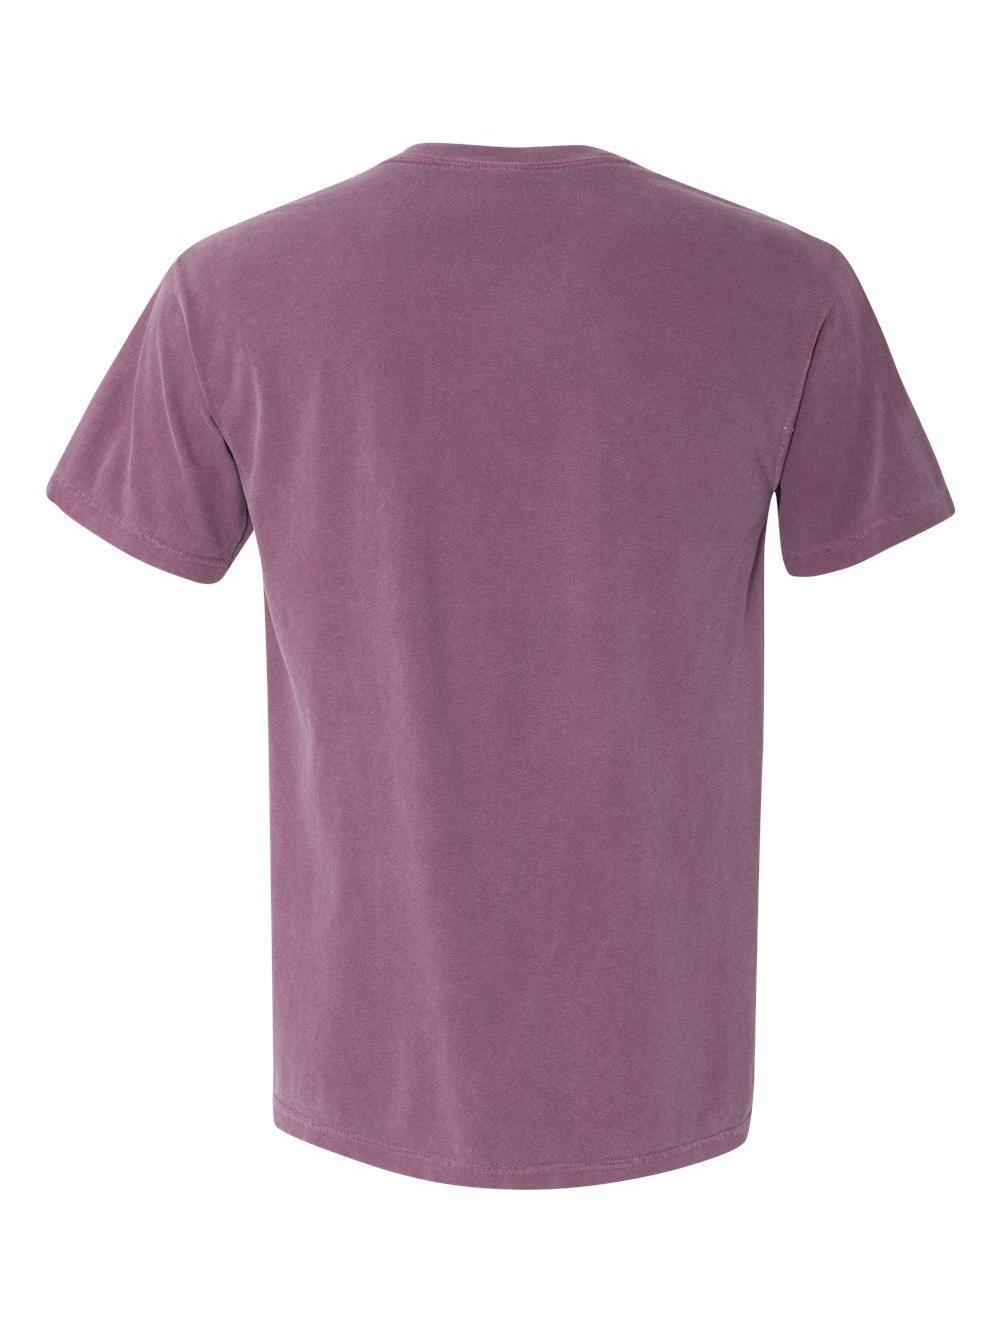 Comfort-Colors-Garment-Dyed-Heavyweight-Ringspun-Short-Sleeve-Shirt-1717 thumbnail 7